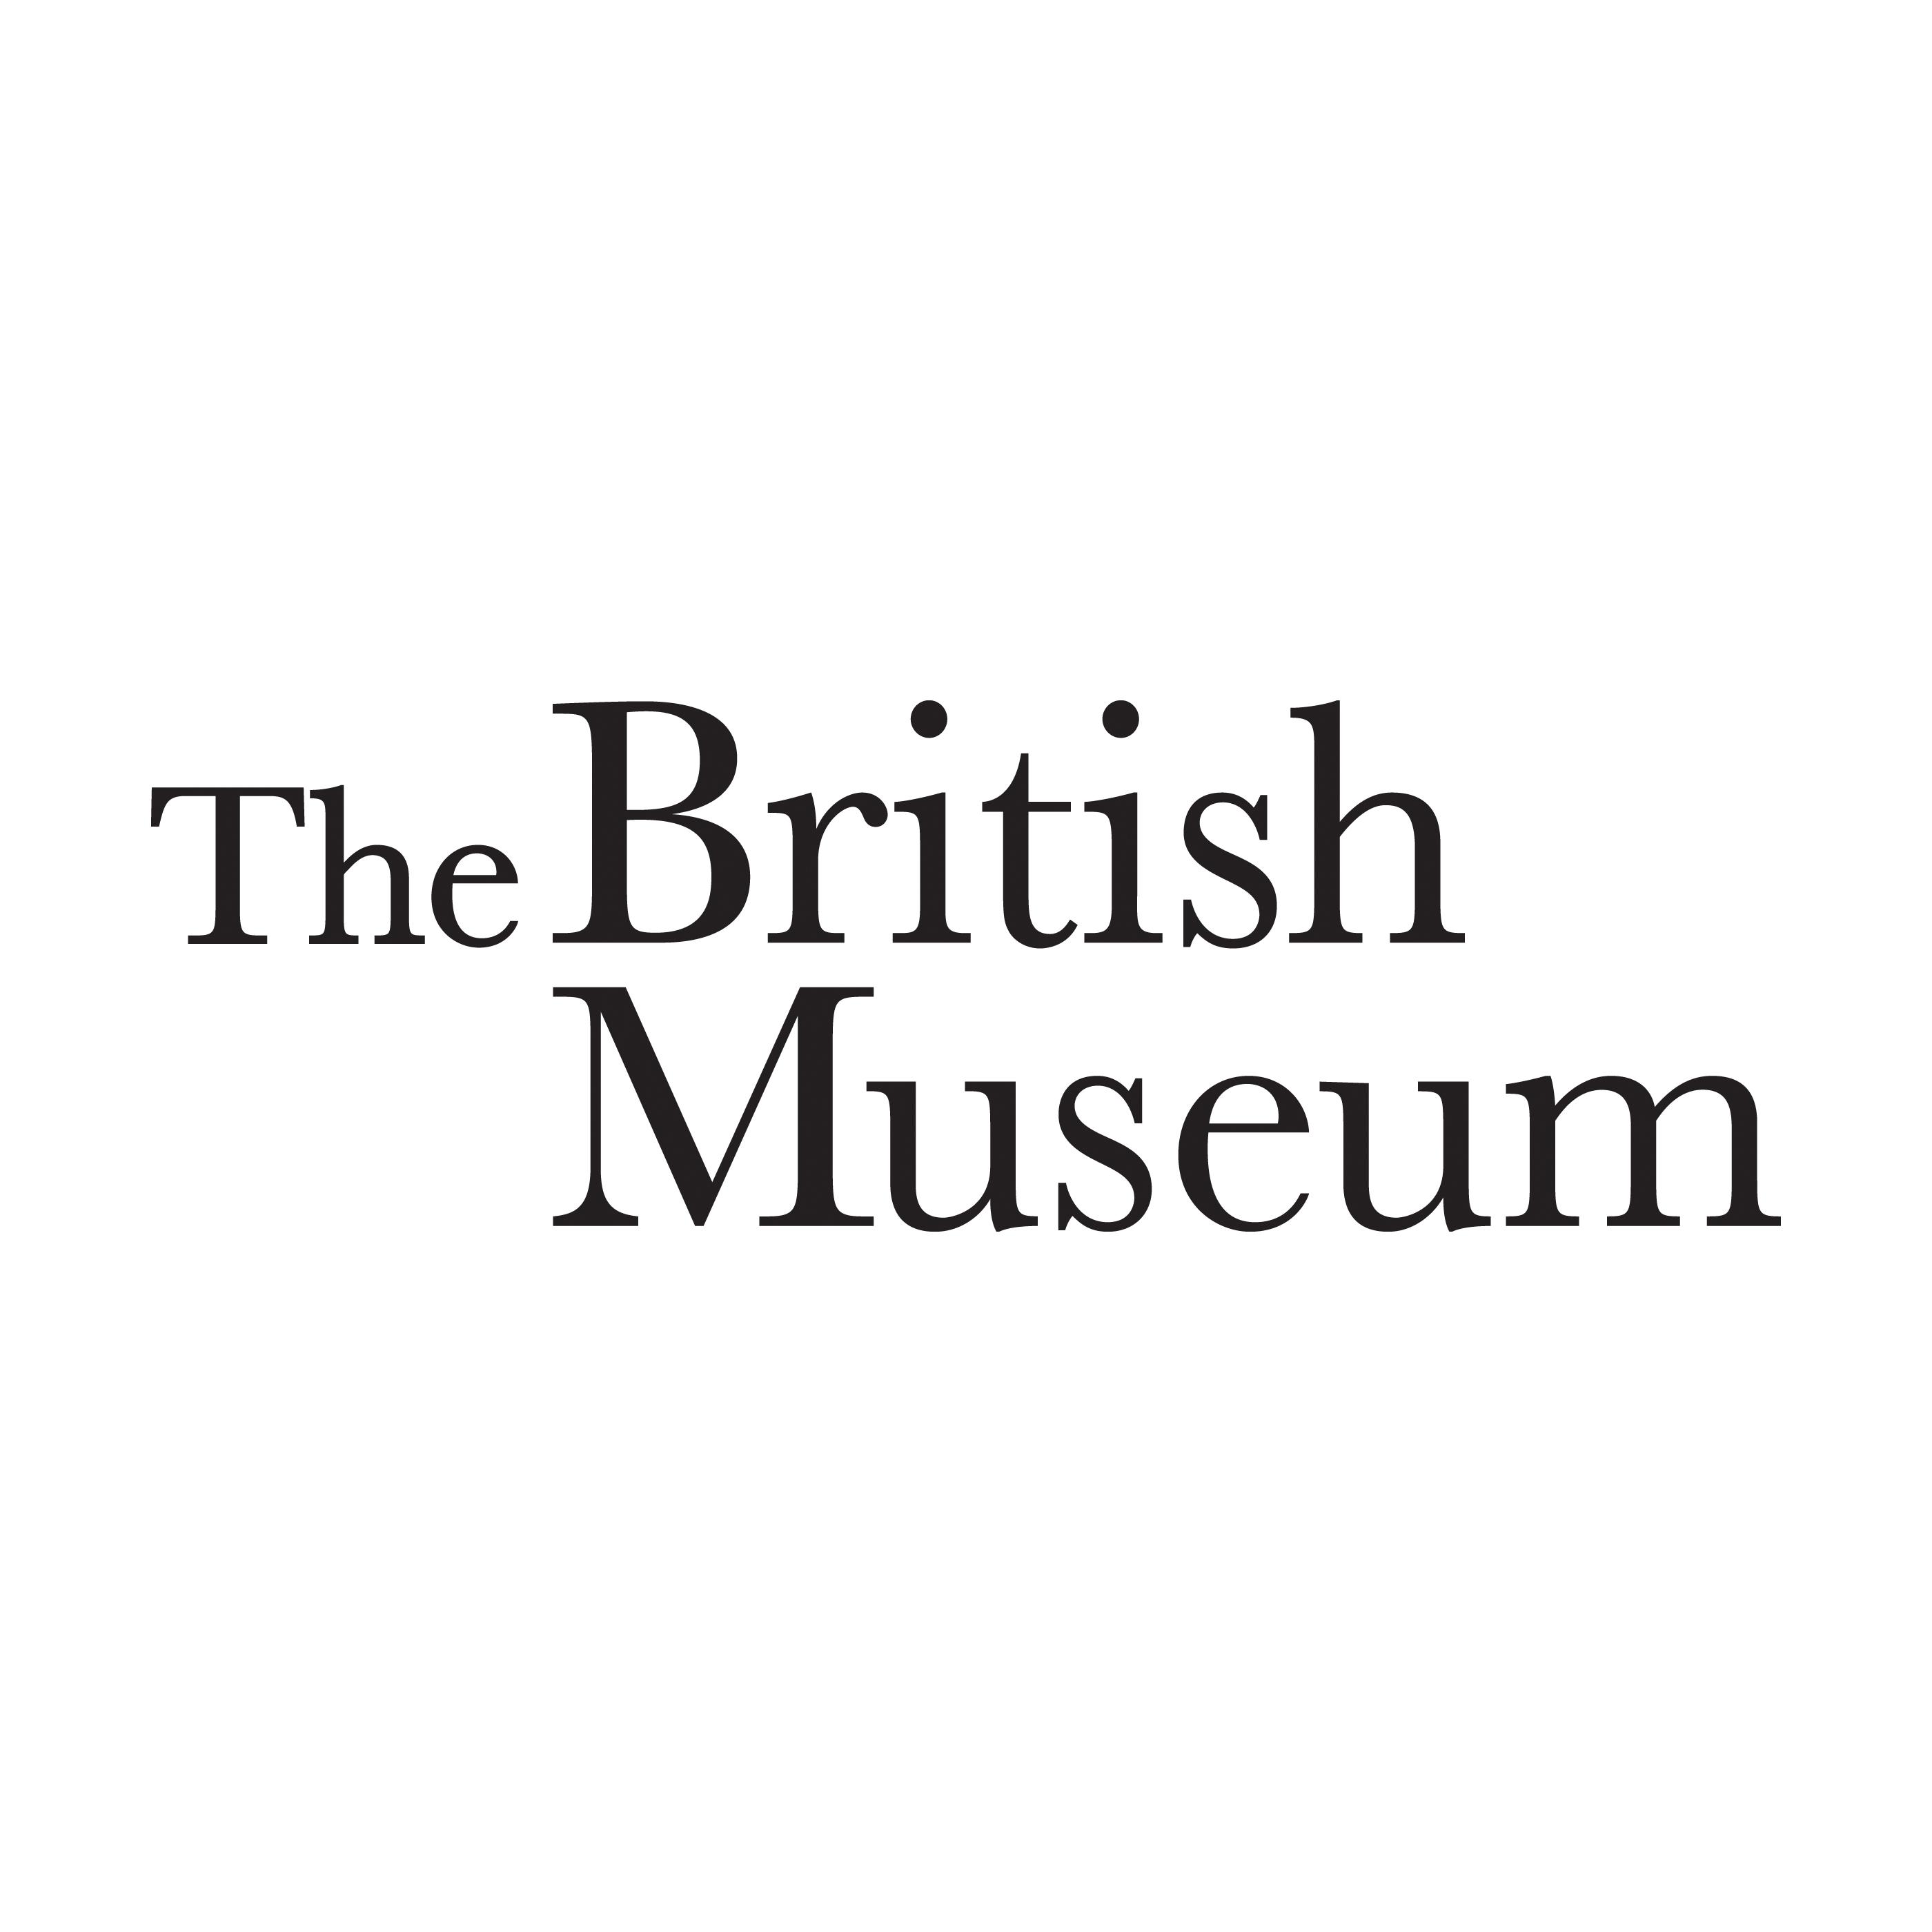 The British Museum Podcast show art